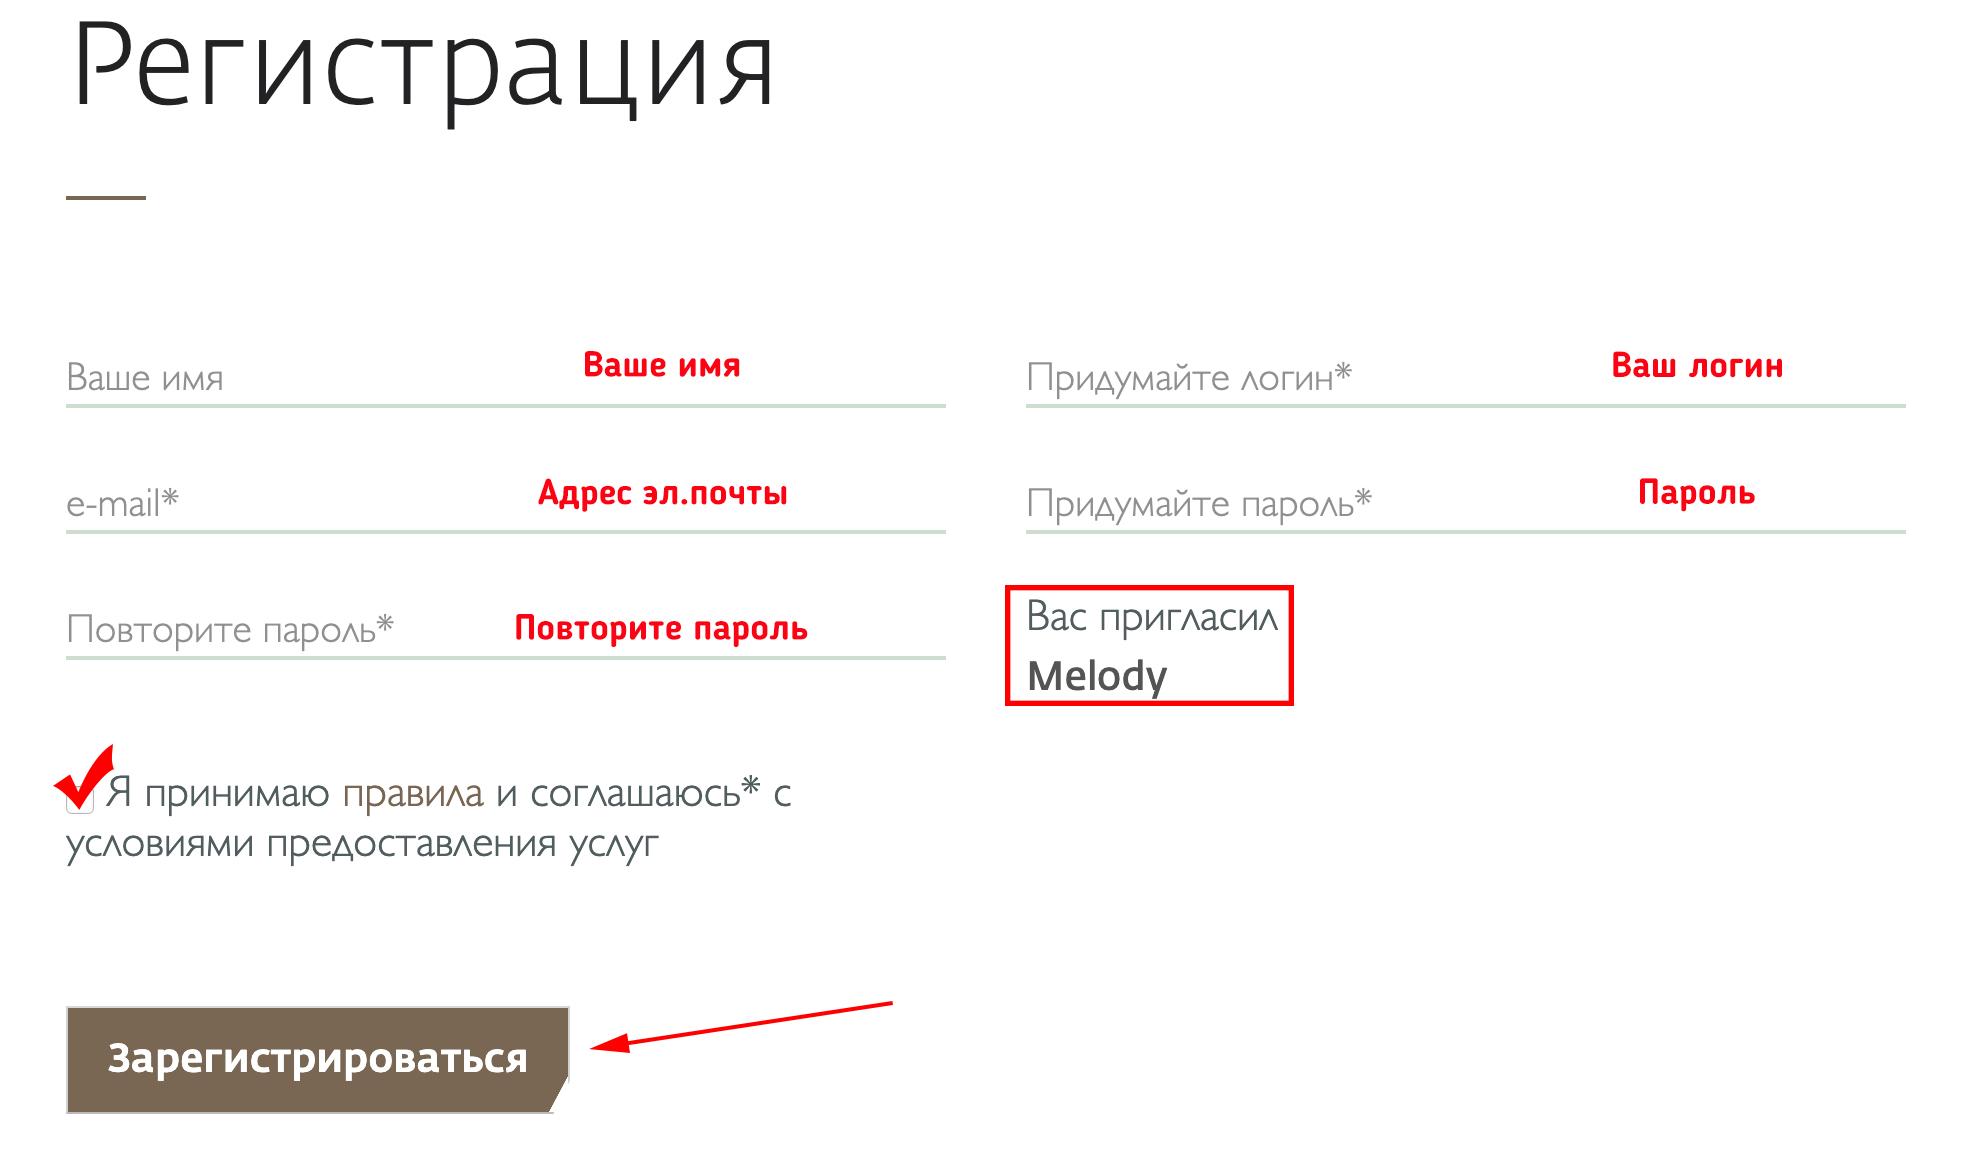 Trust-Invest-Capital-registratsiya.jpg